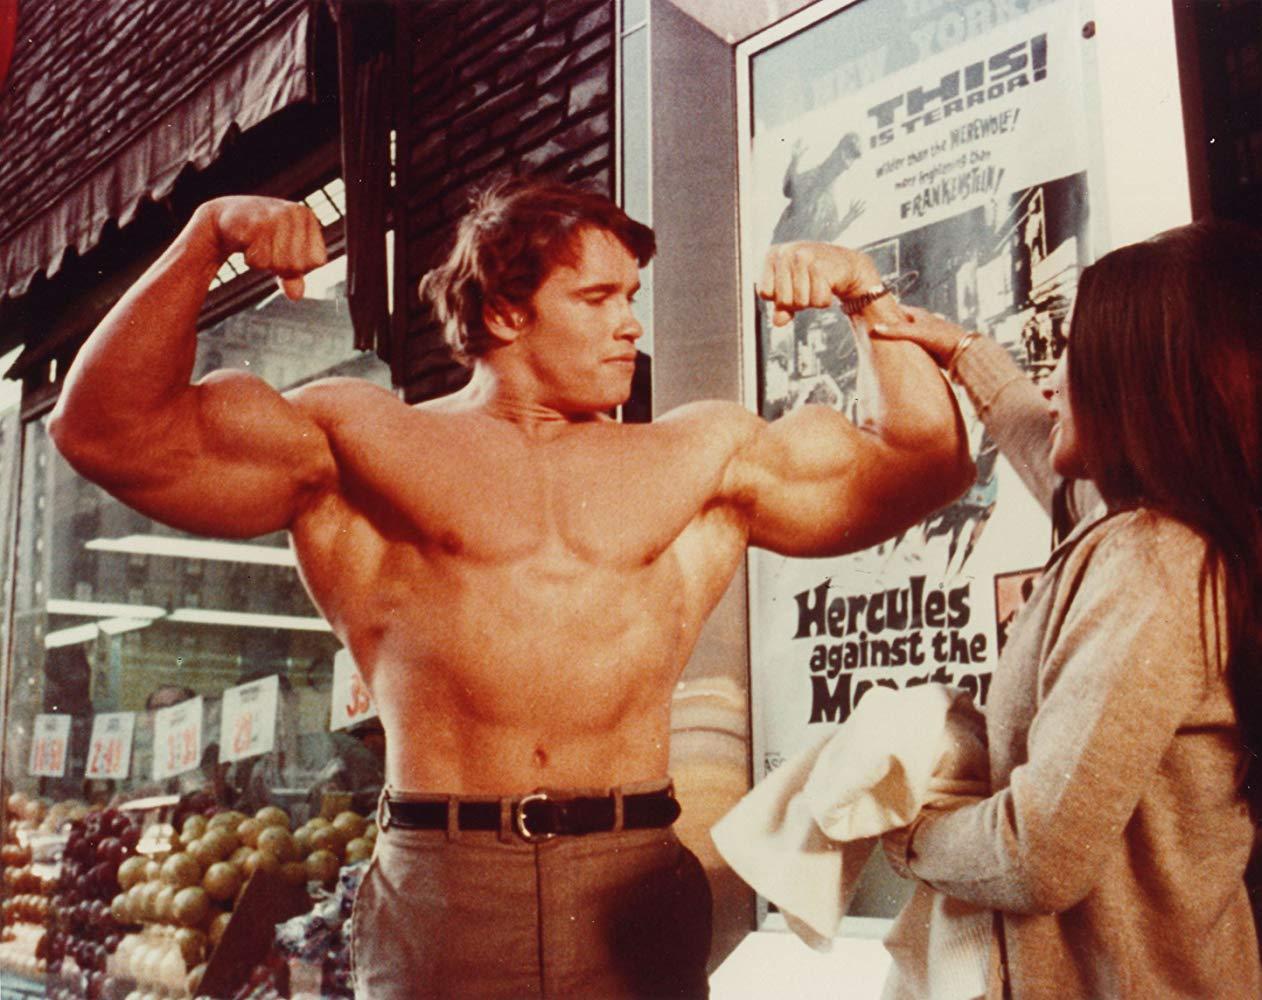 Hercules (Arnold Schwarzenegger) shows off his muscles in Hercules in New York (1970)